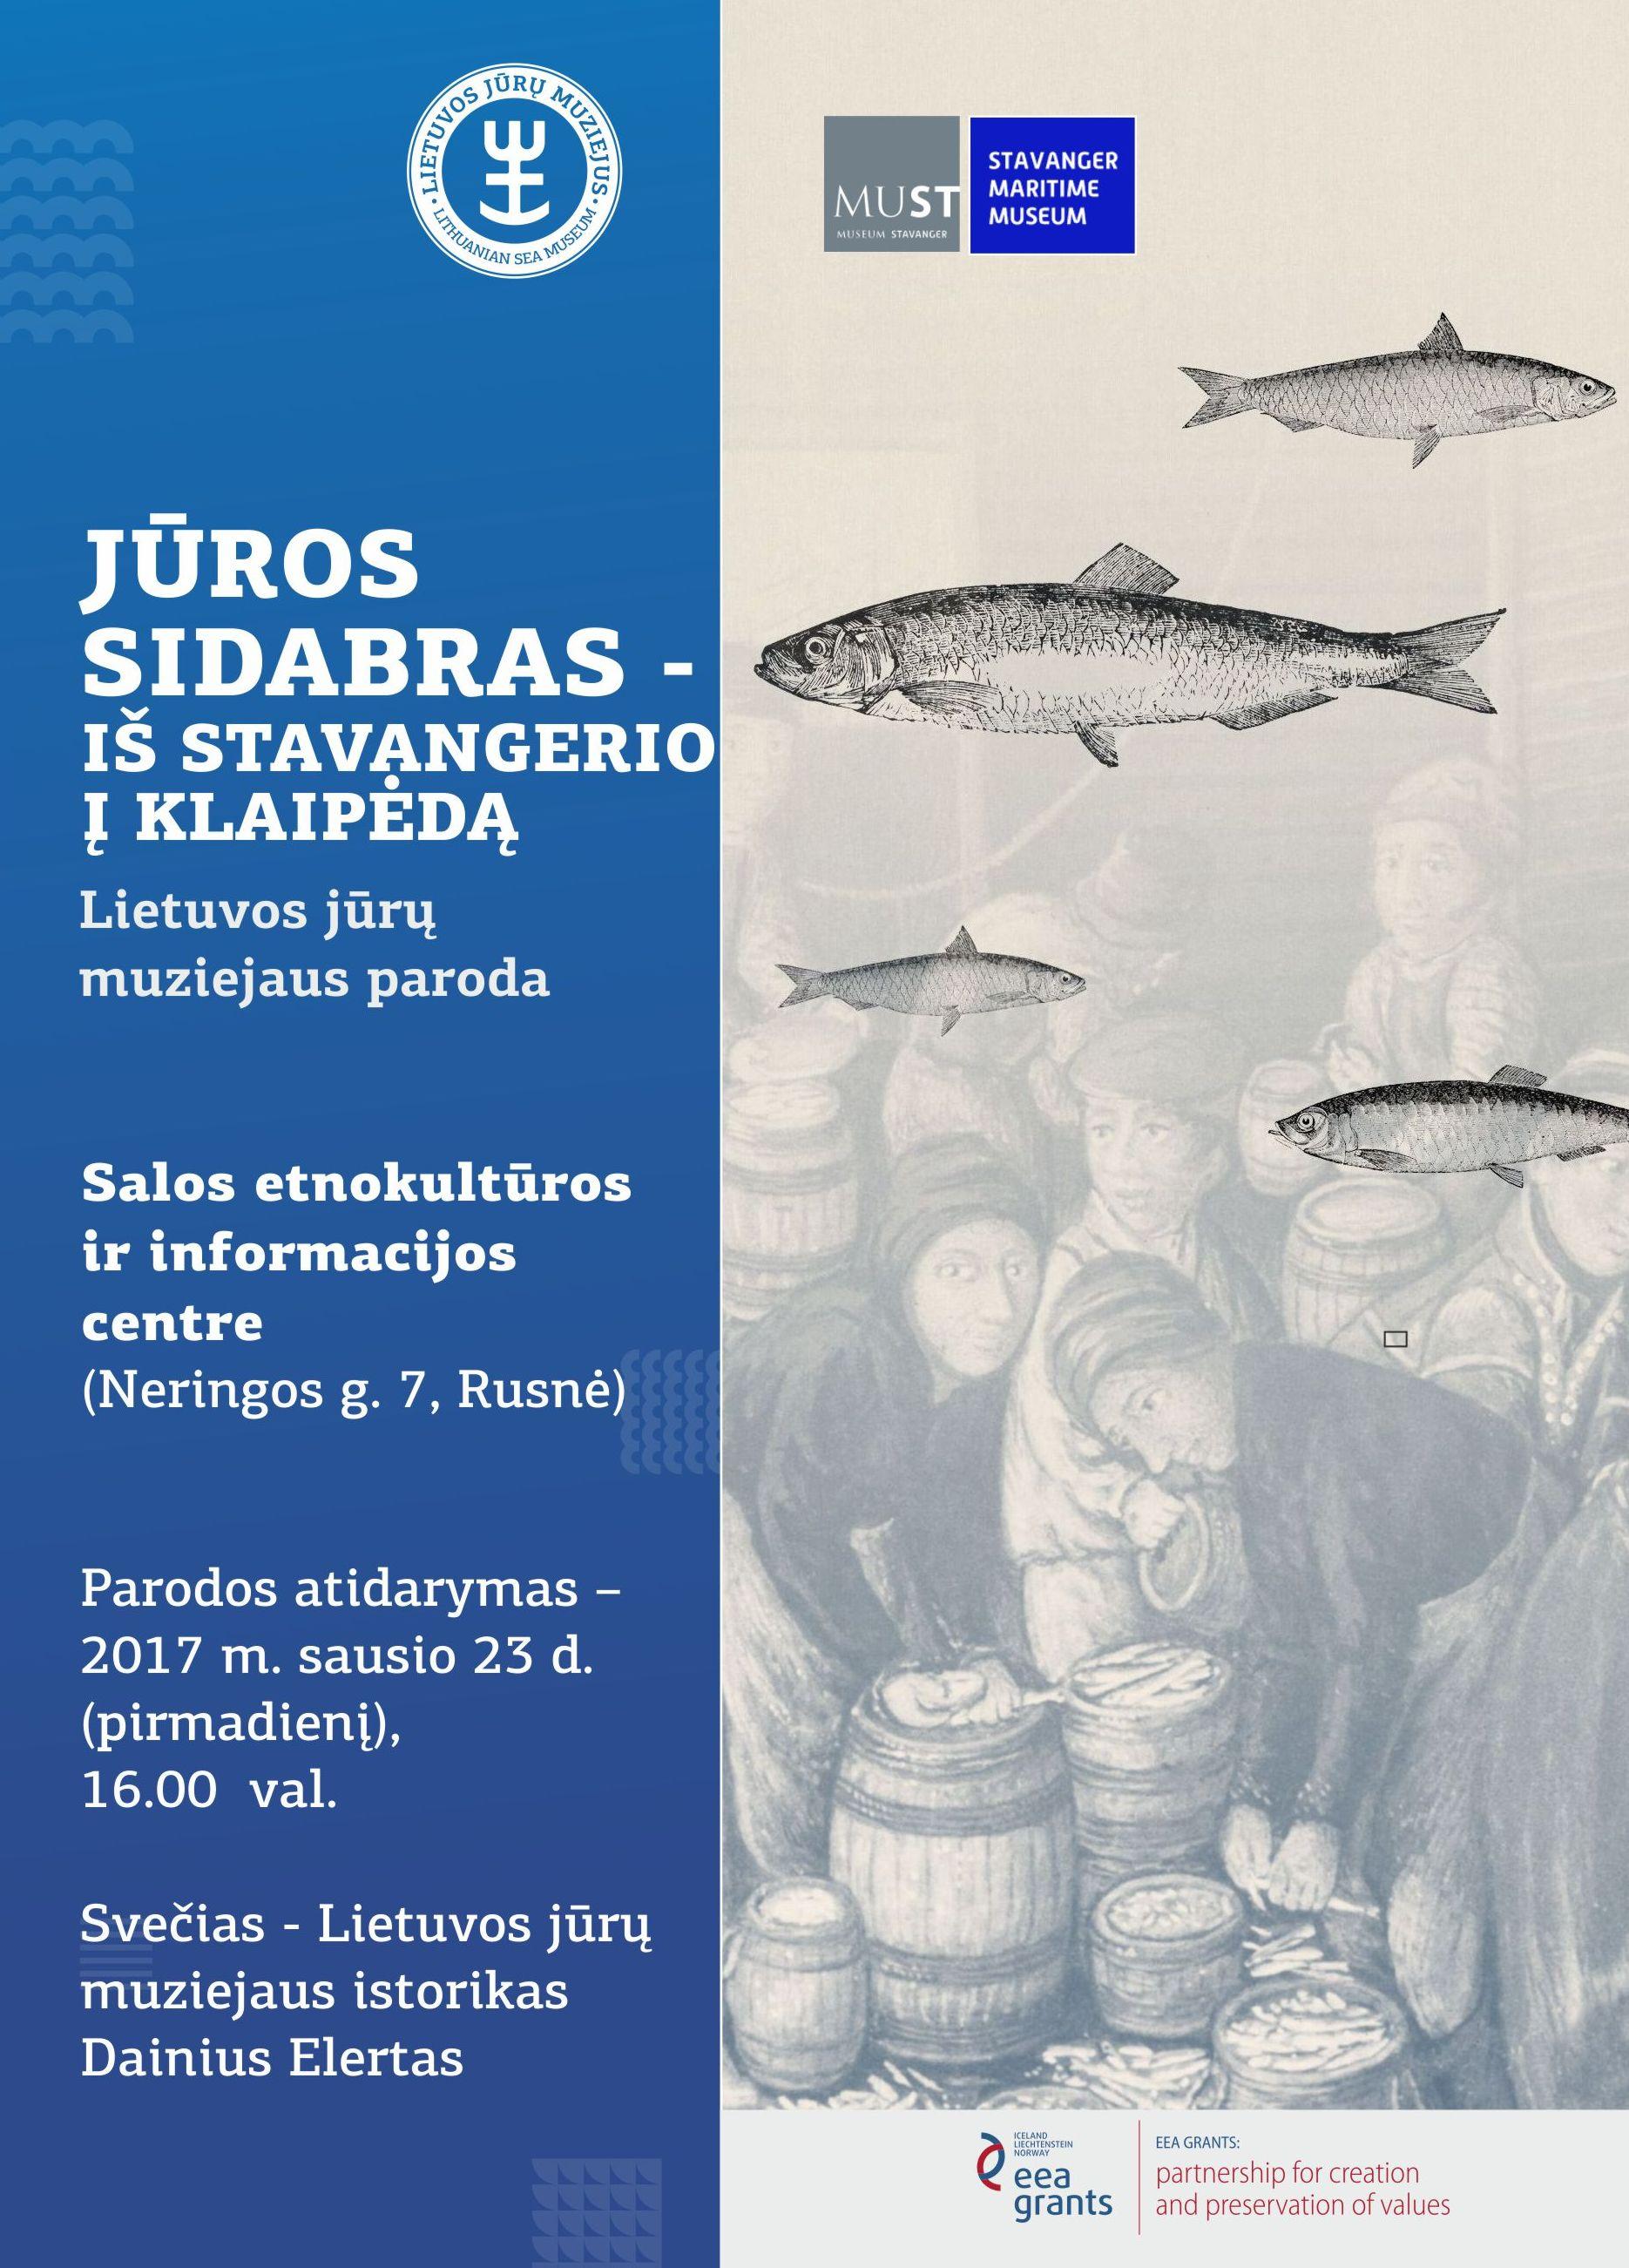 Juros_sidabras_plakatas_RUSNE